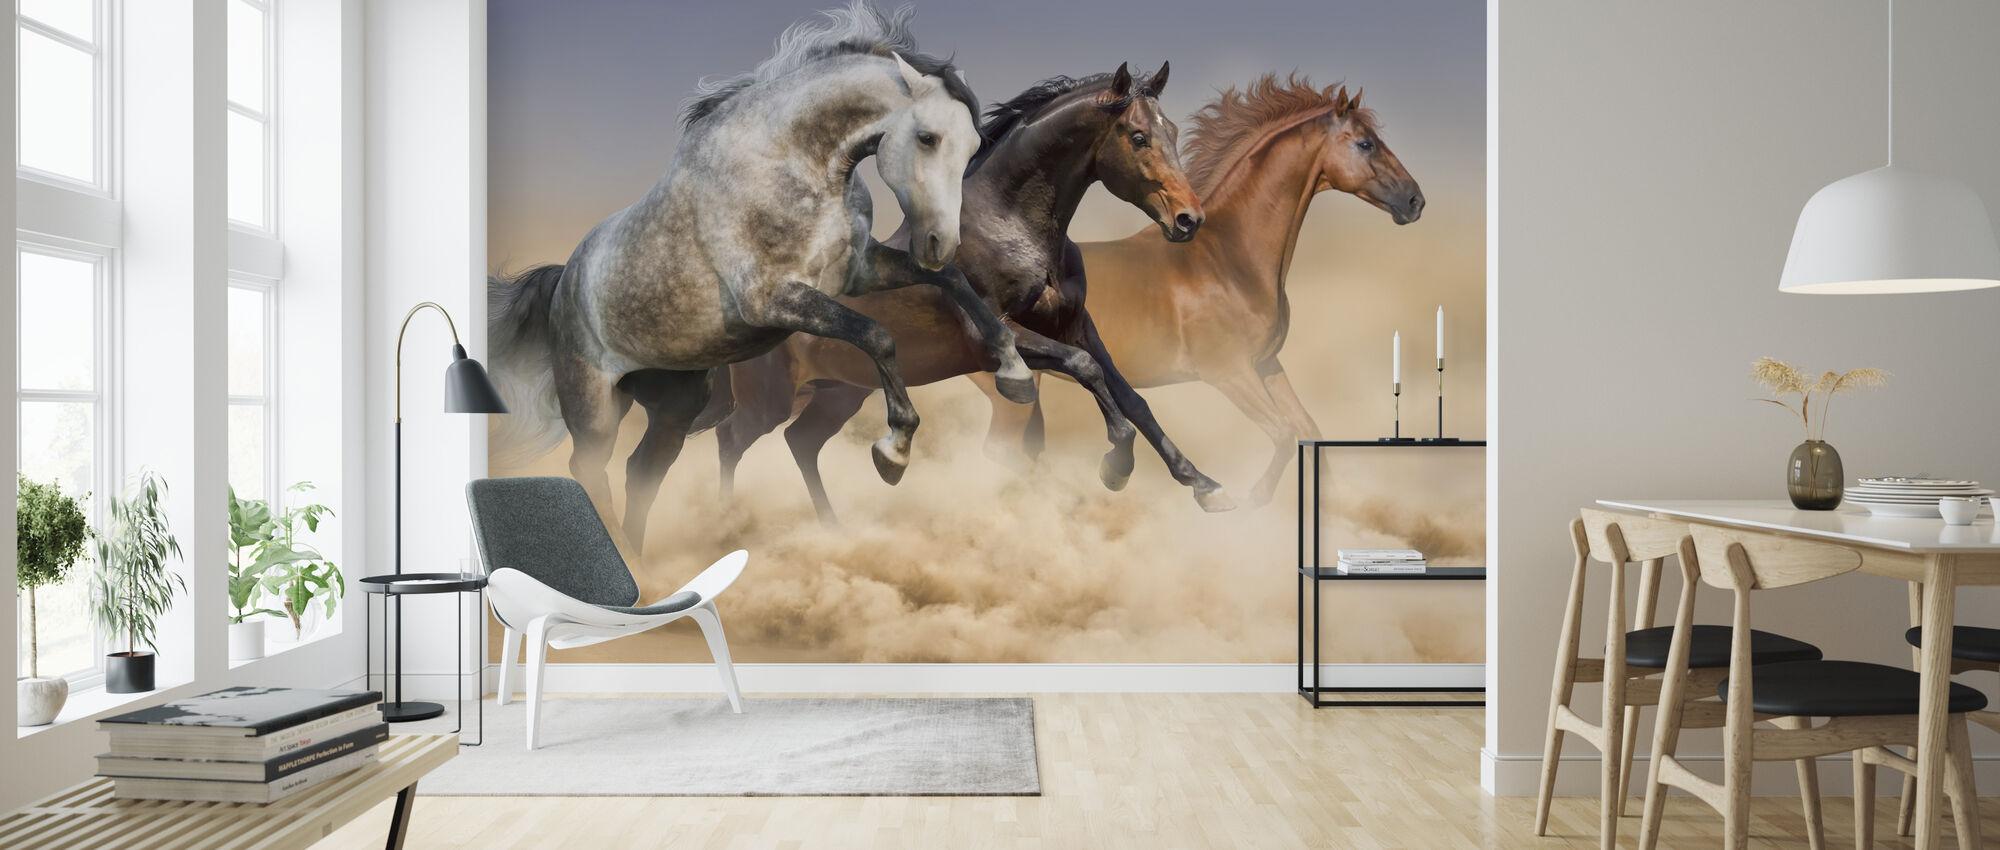 Three Horses Run - Wallpaper - Living Room